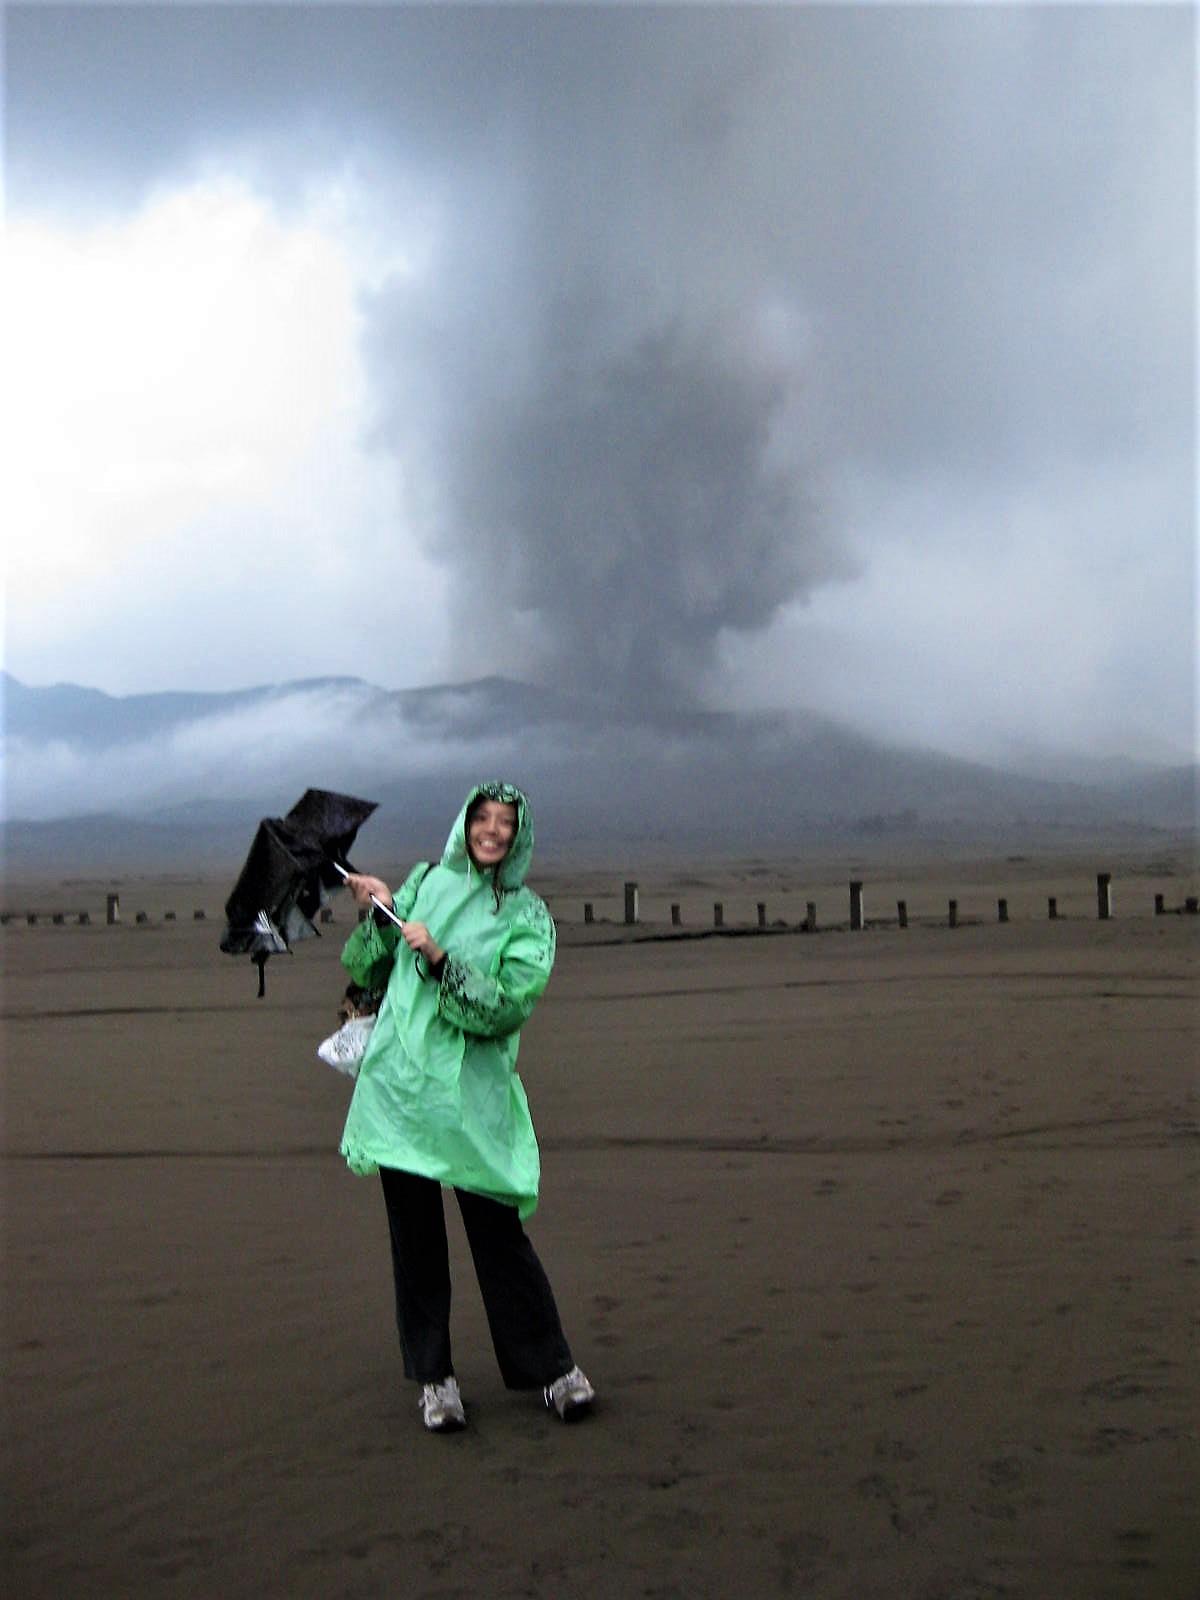 eruption of Mount Bromo in 2010